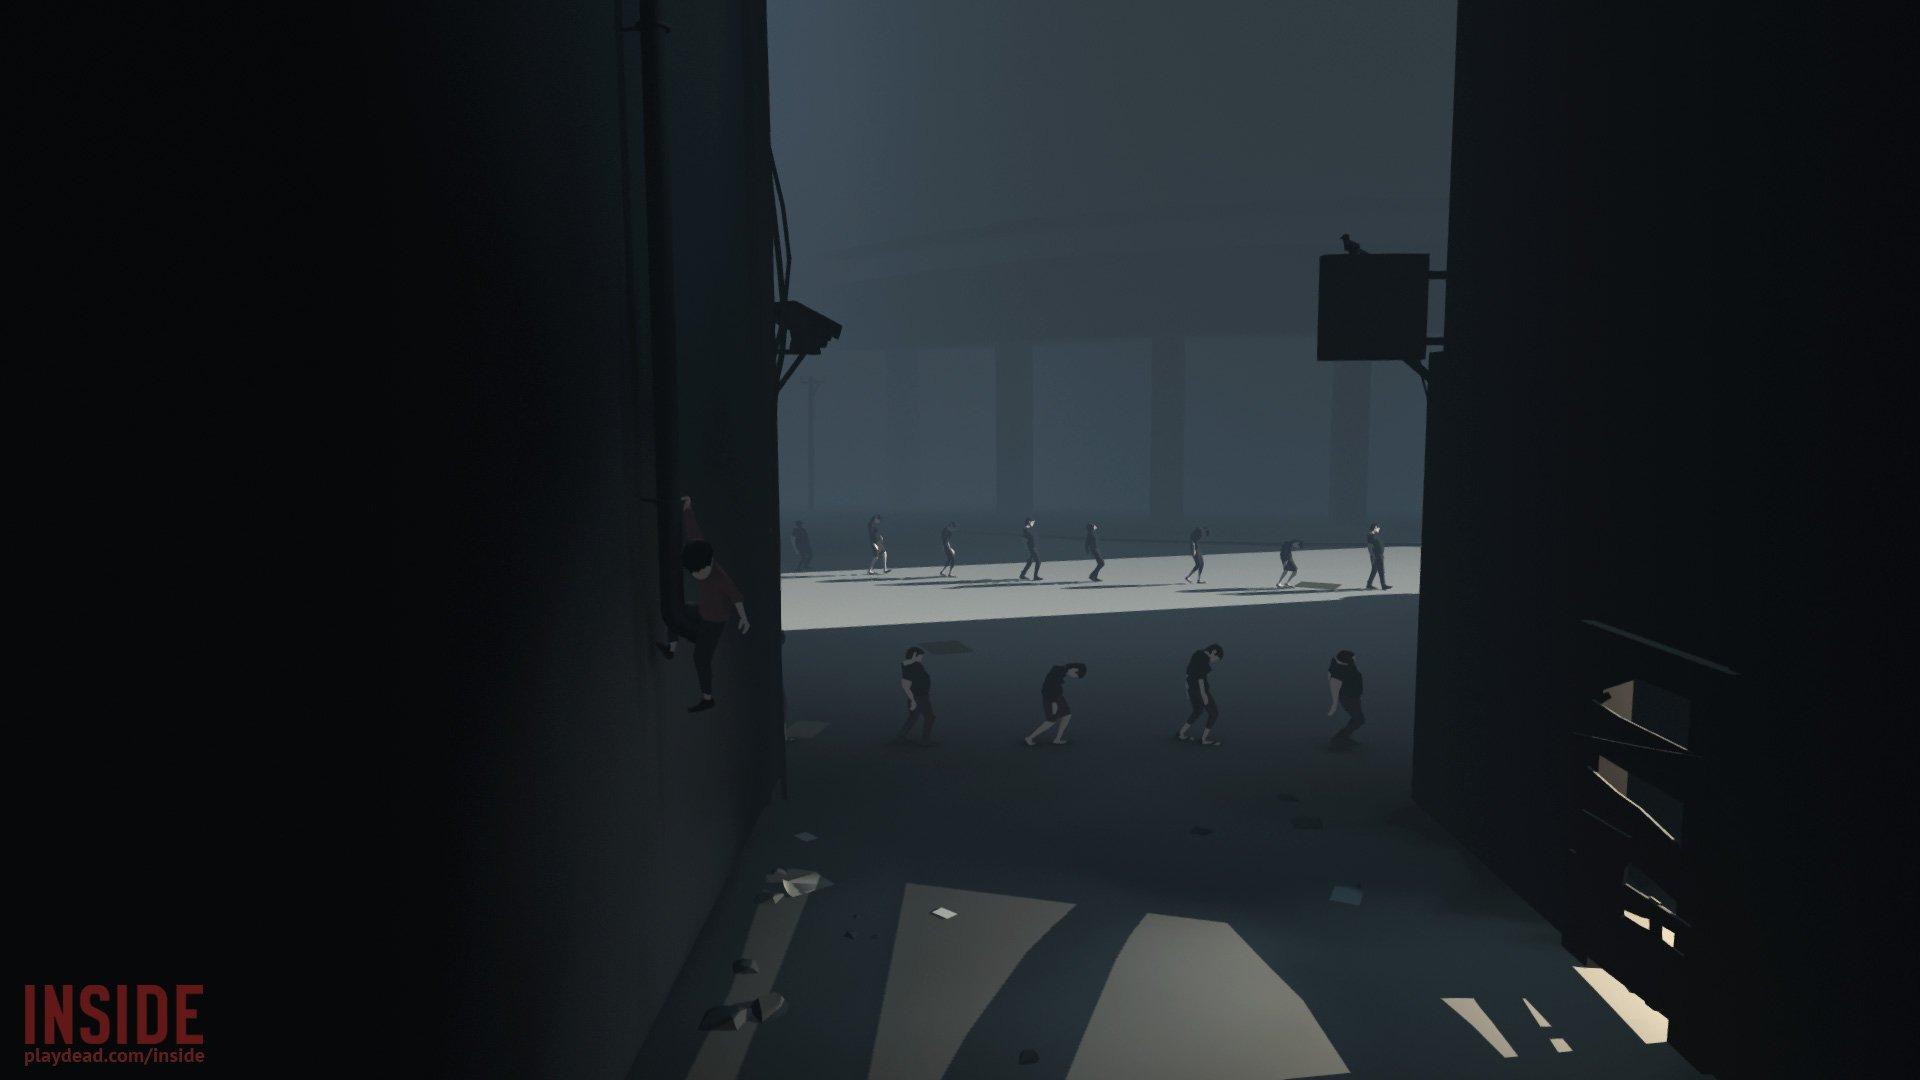 inside-game-zombie-kid-stealth-gameplay-screenshot-xbox-one